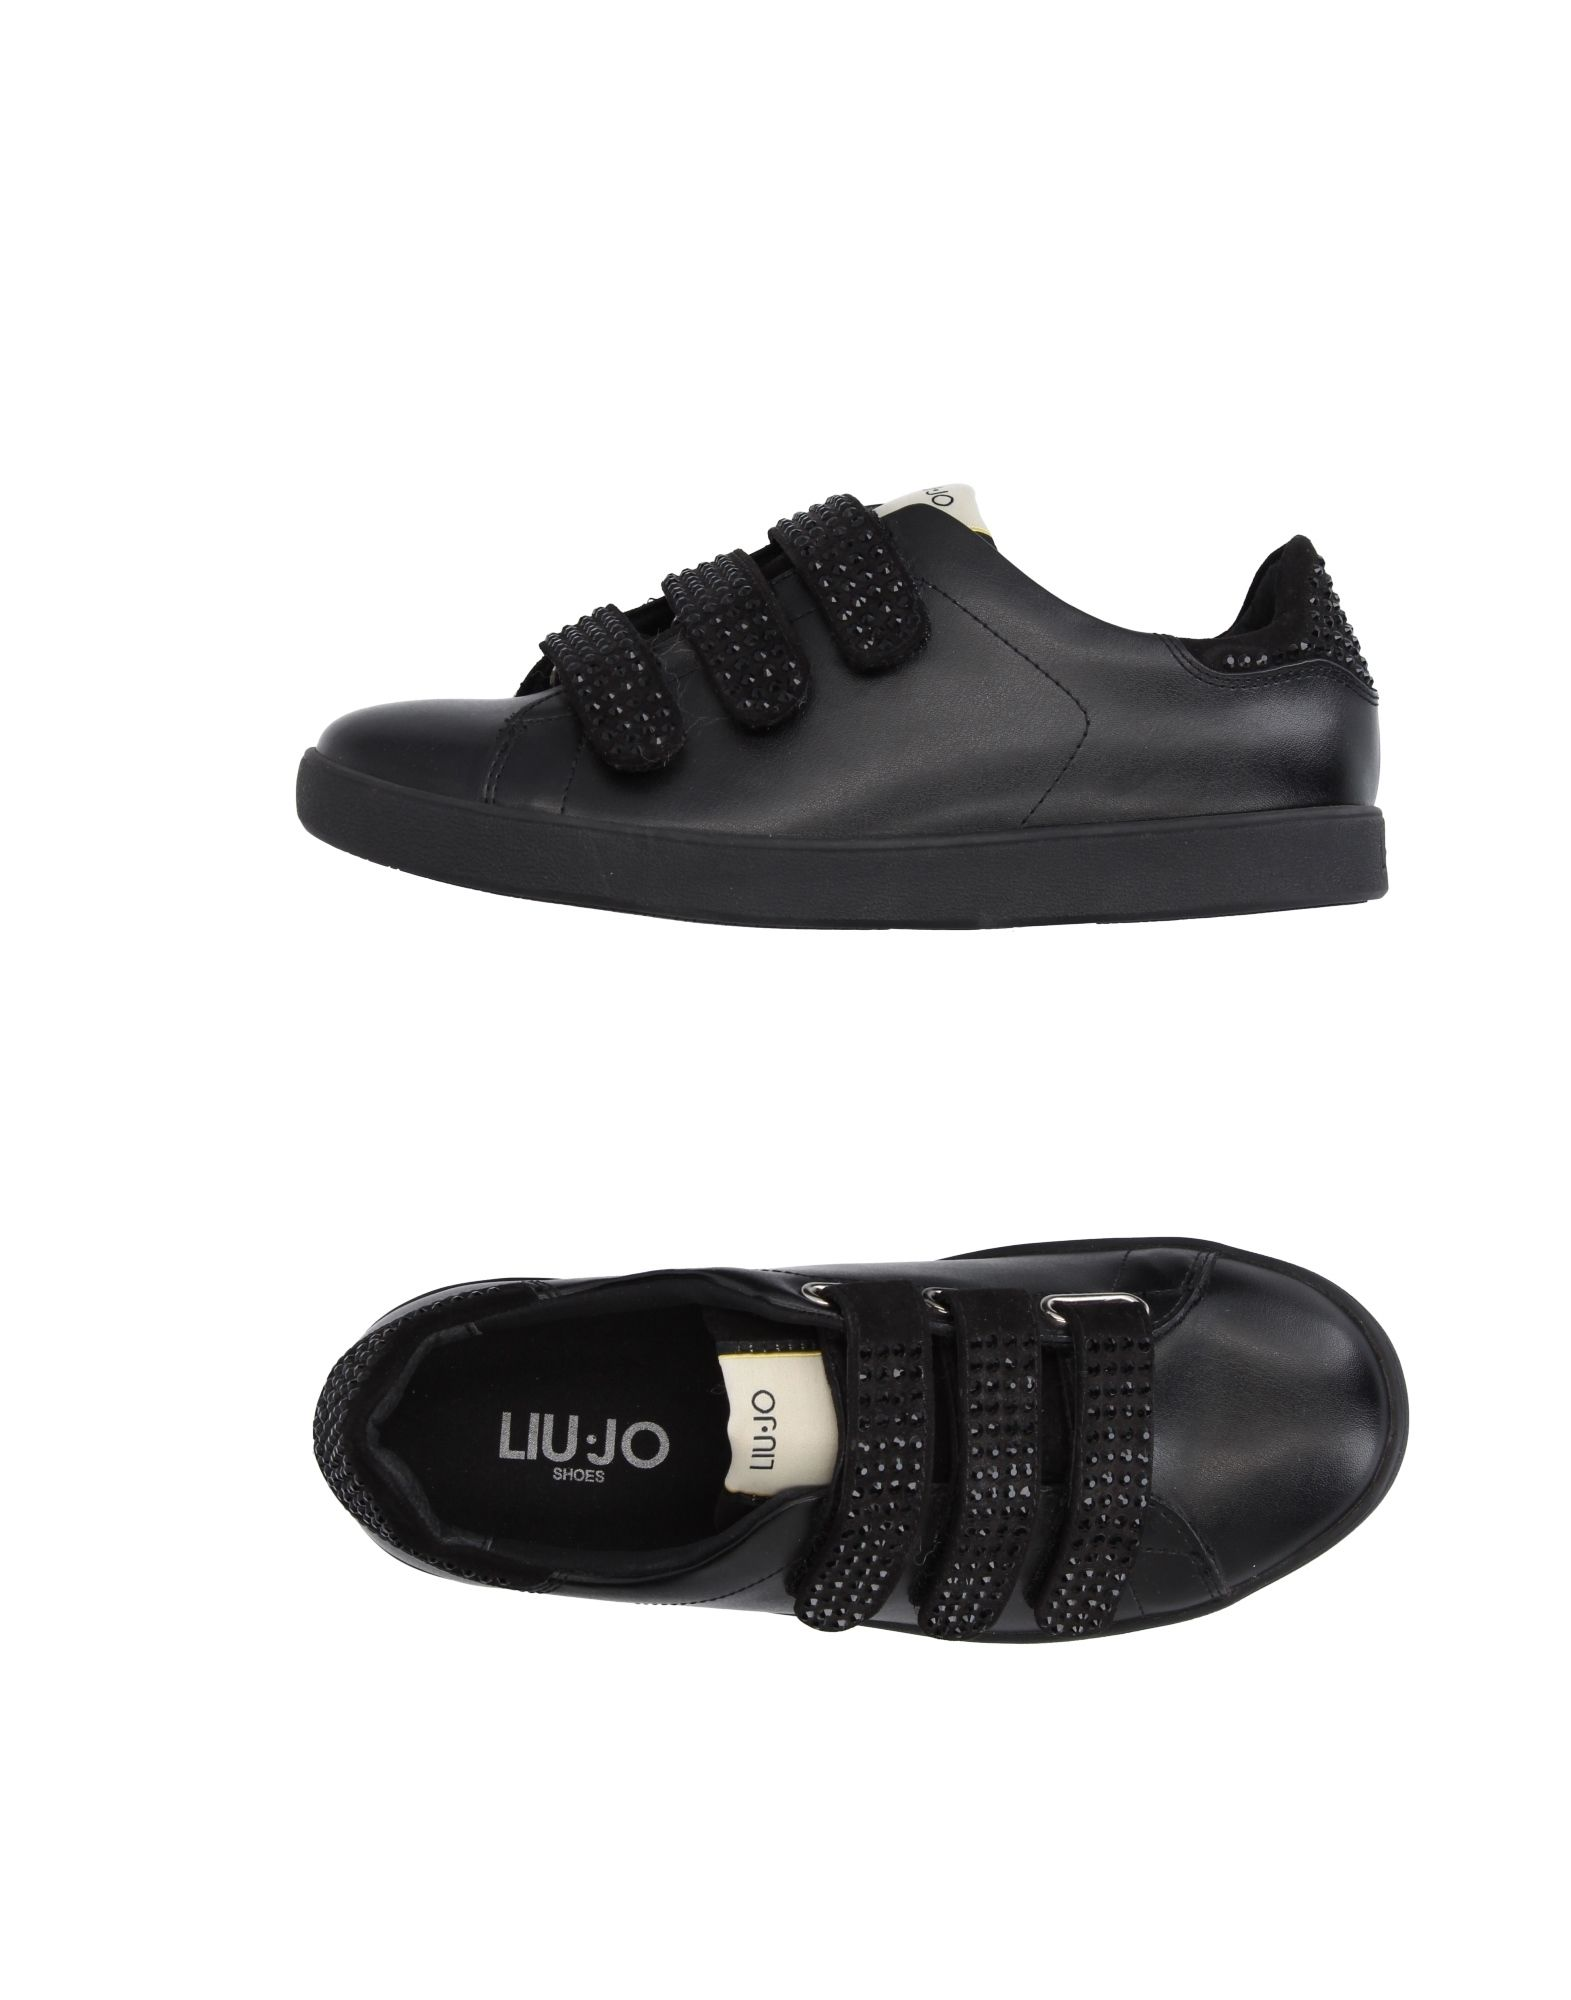 Moda barata y hermosa Zapatillas Liu ?Jo Zapatillas Shoes Mujer - Zapatillas ?Jo Liu ?Jo Shoes  Blanco 342e68